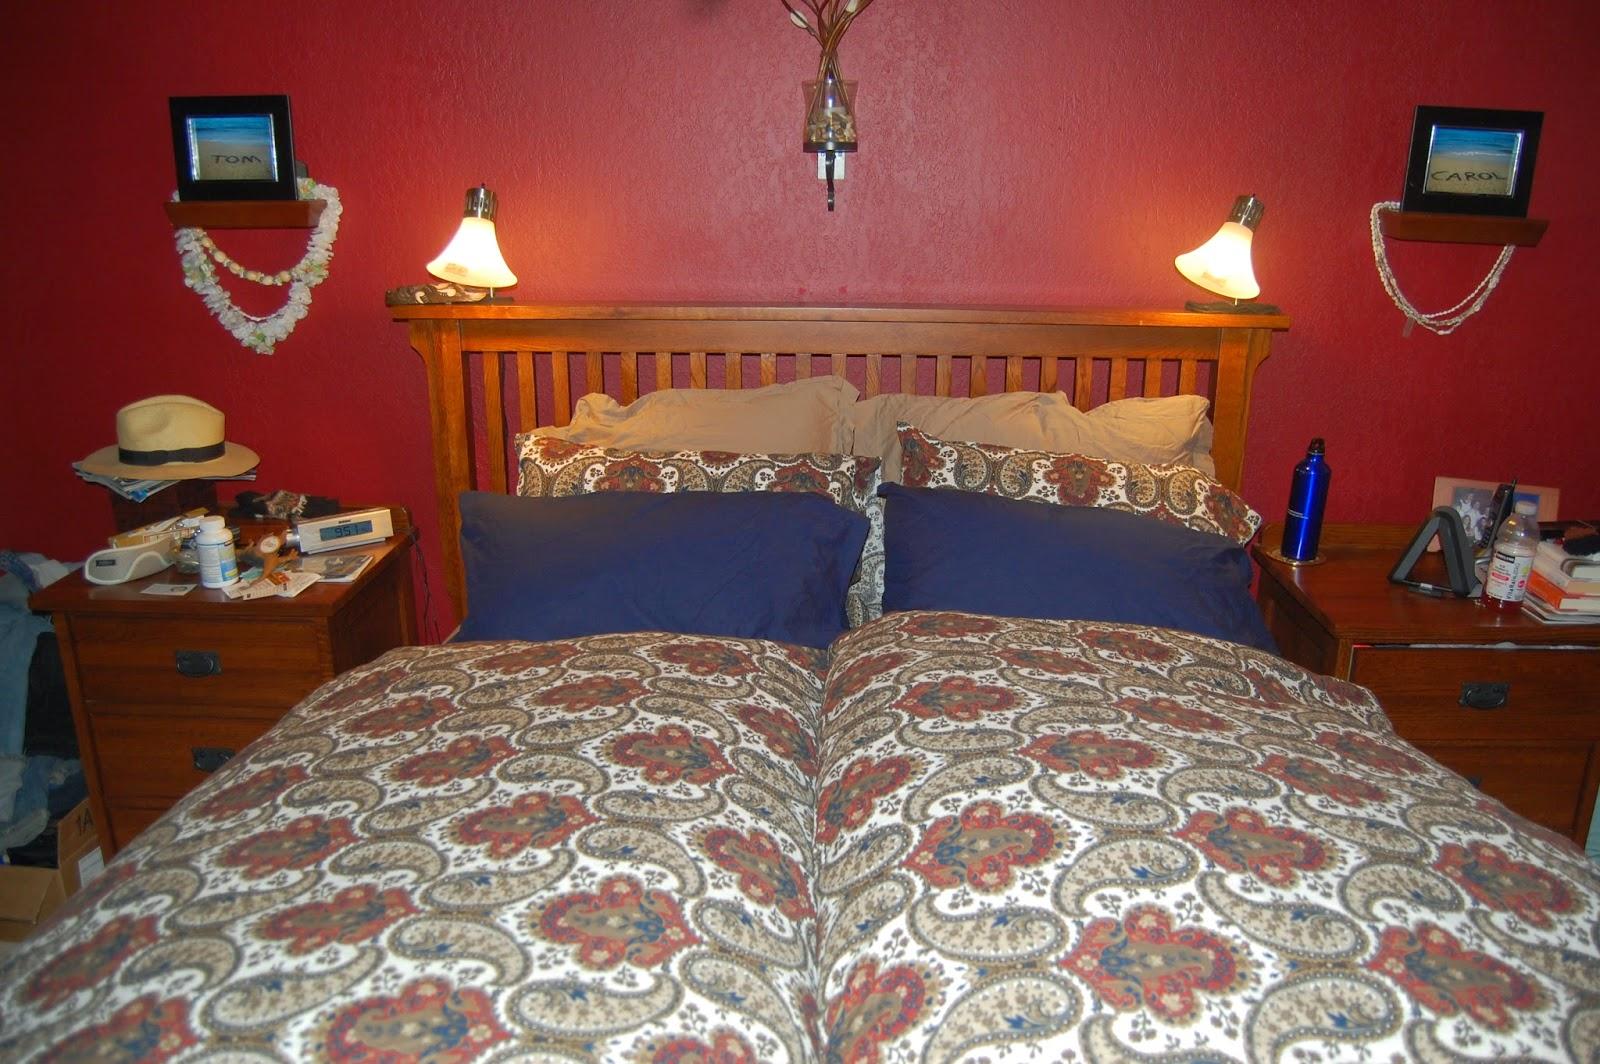 Northwest Ladybug A German Bedding Crisis In America